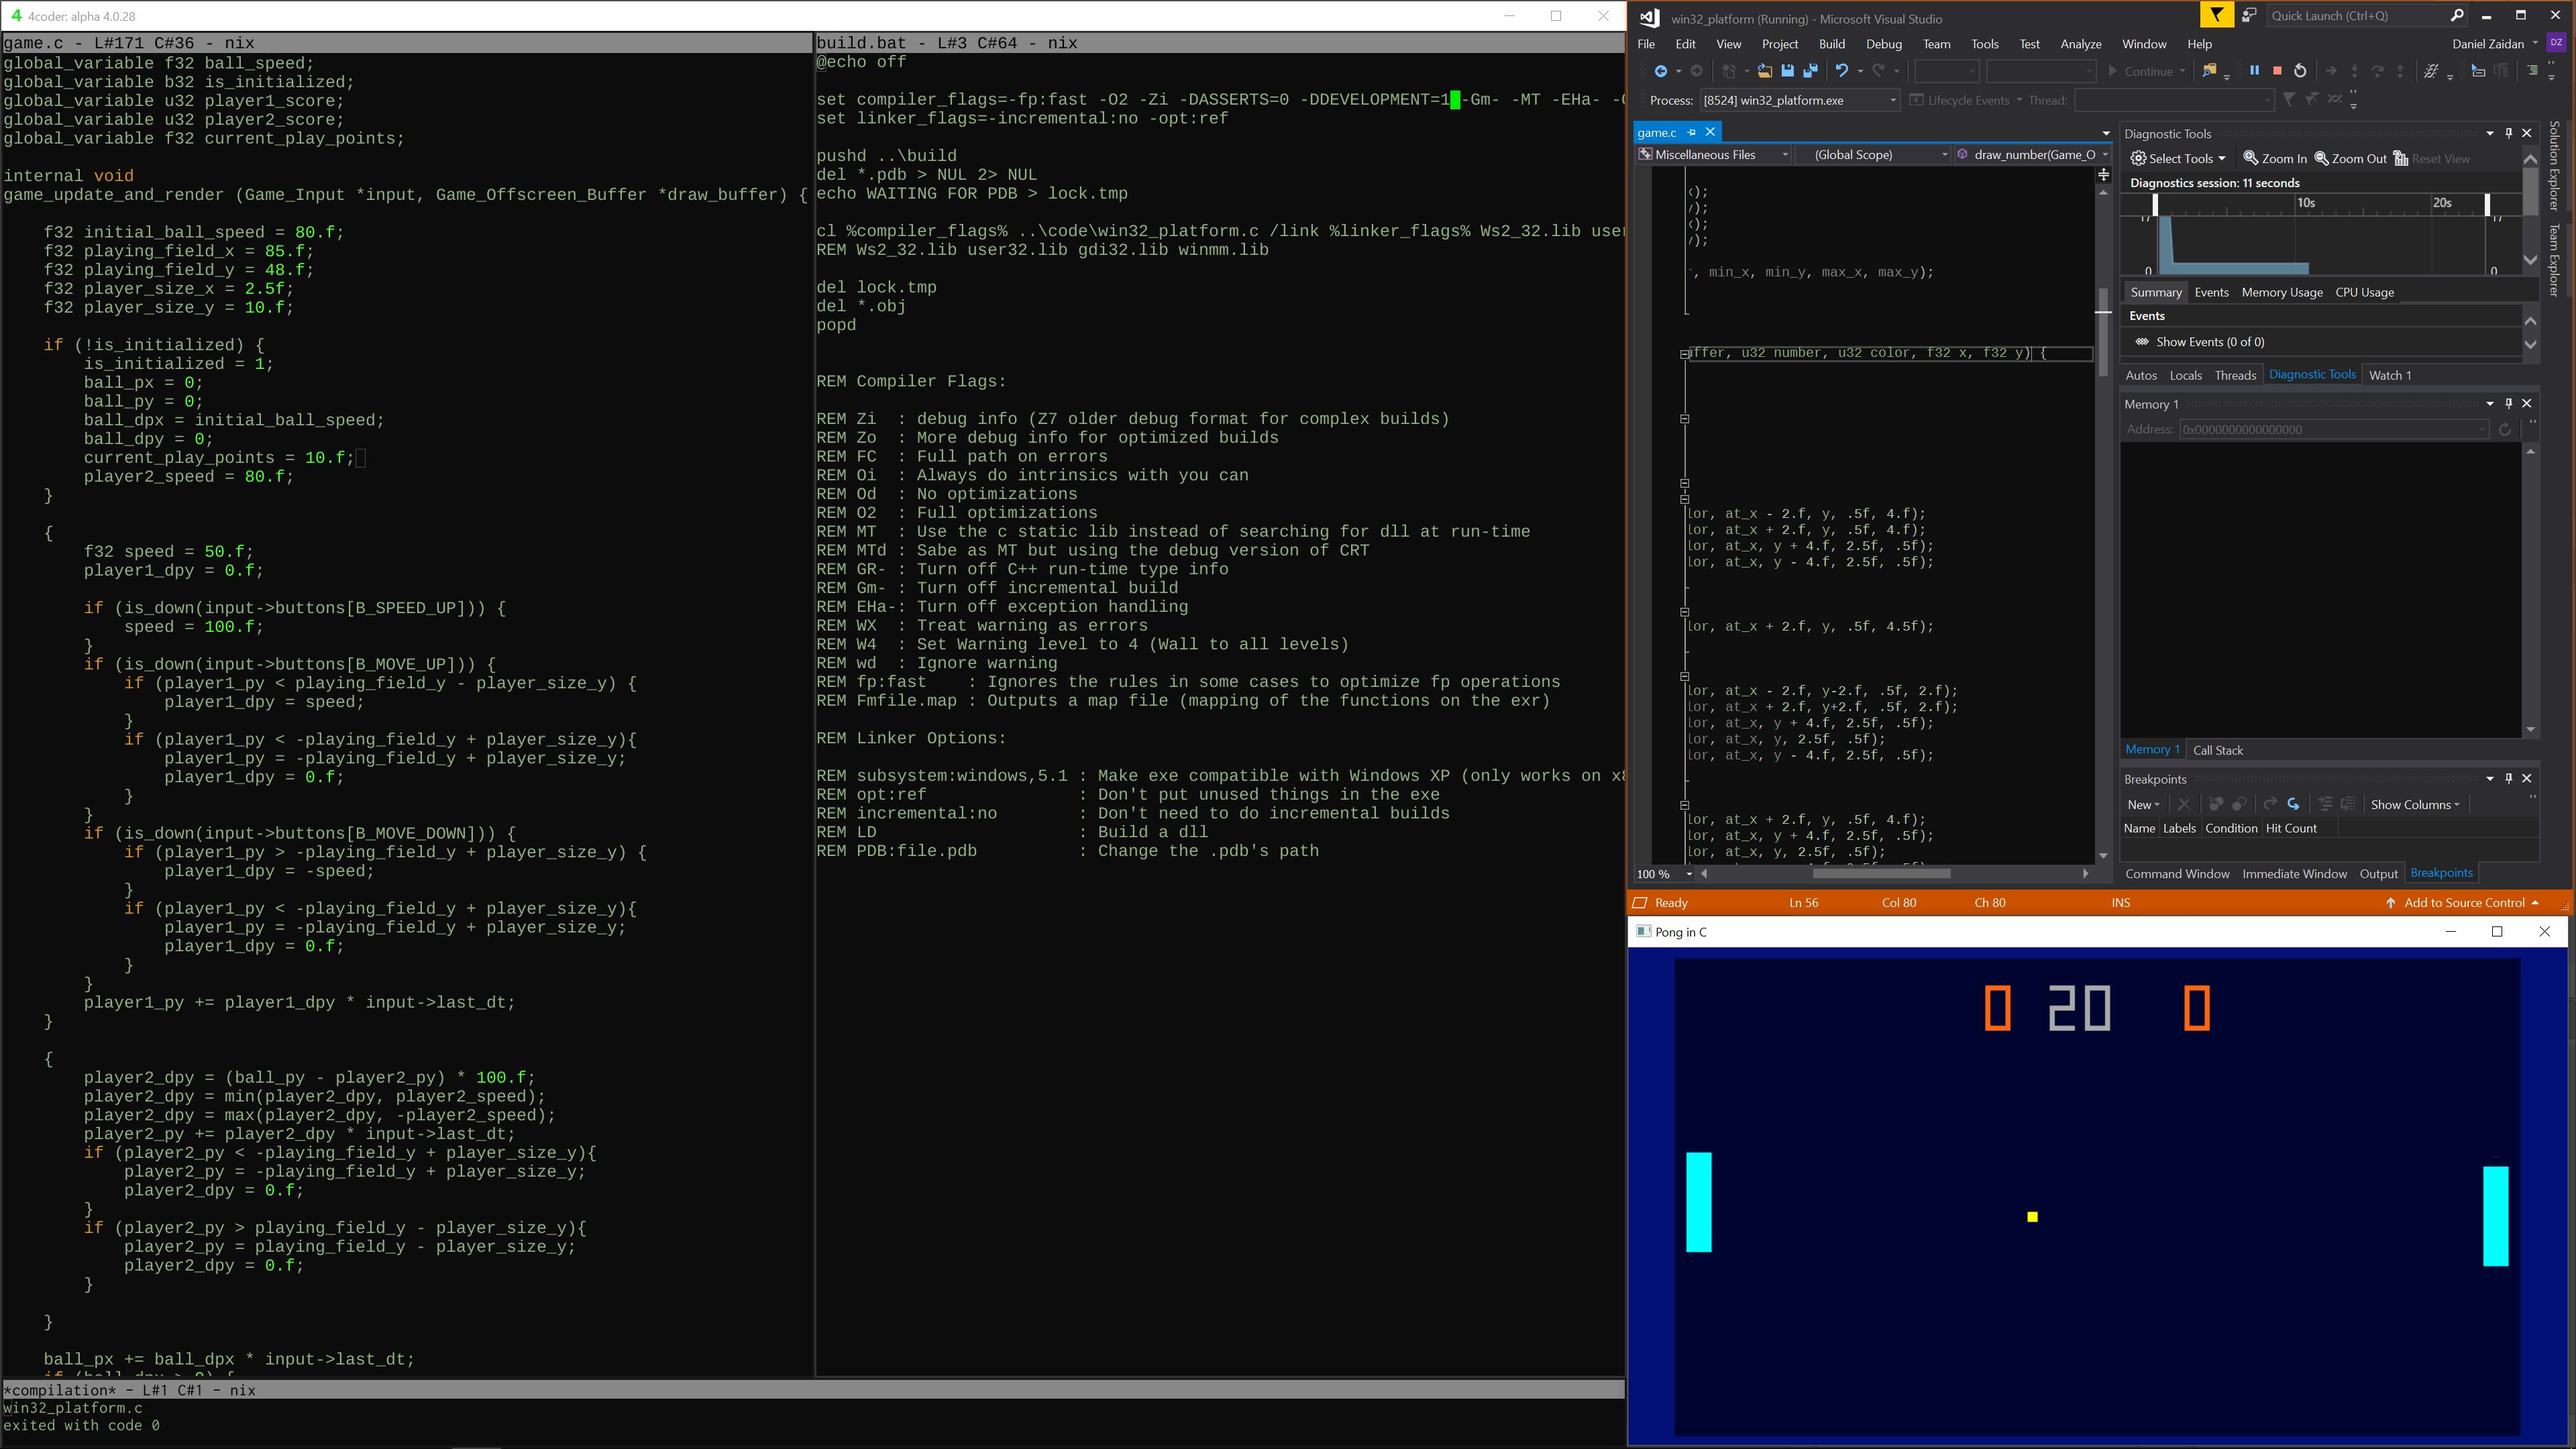 Pong in C with Source Code! - Pong in C (open source) by Dan Zaidan